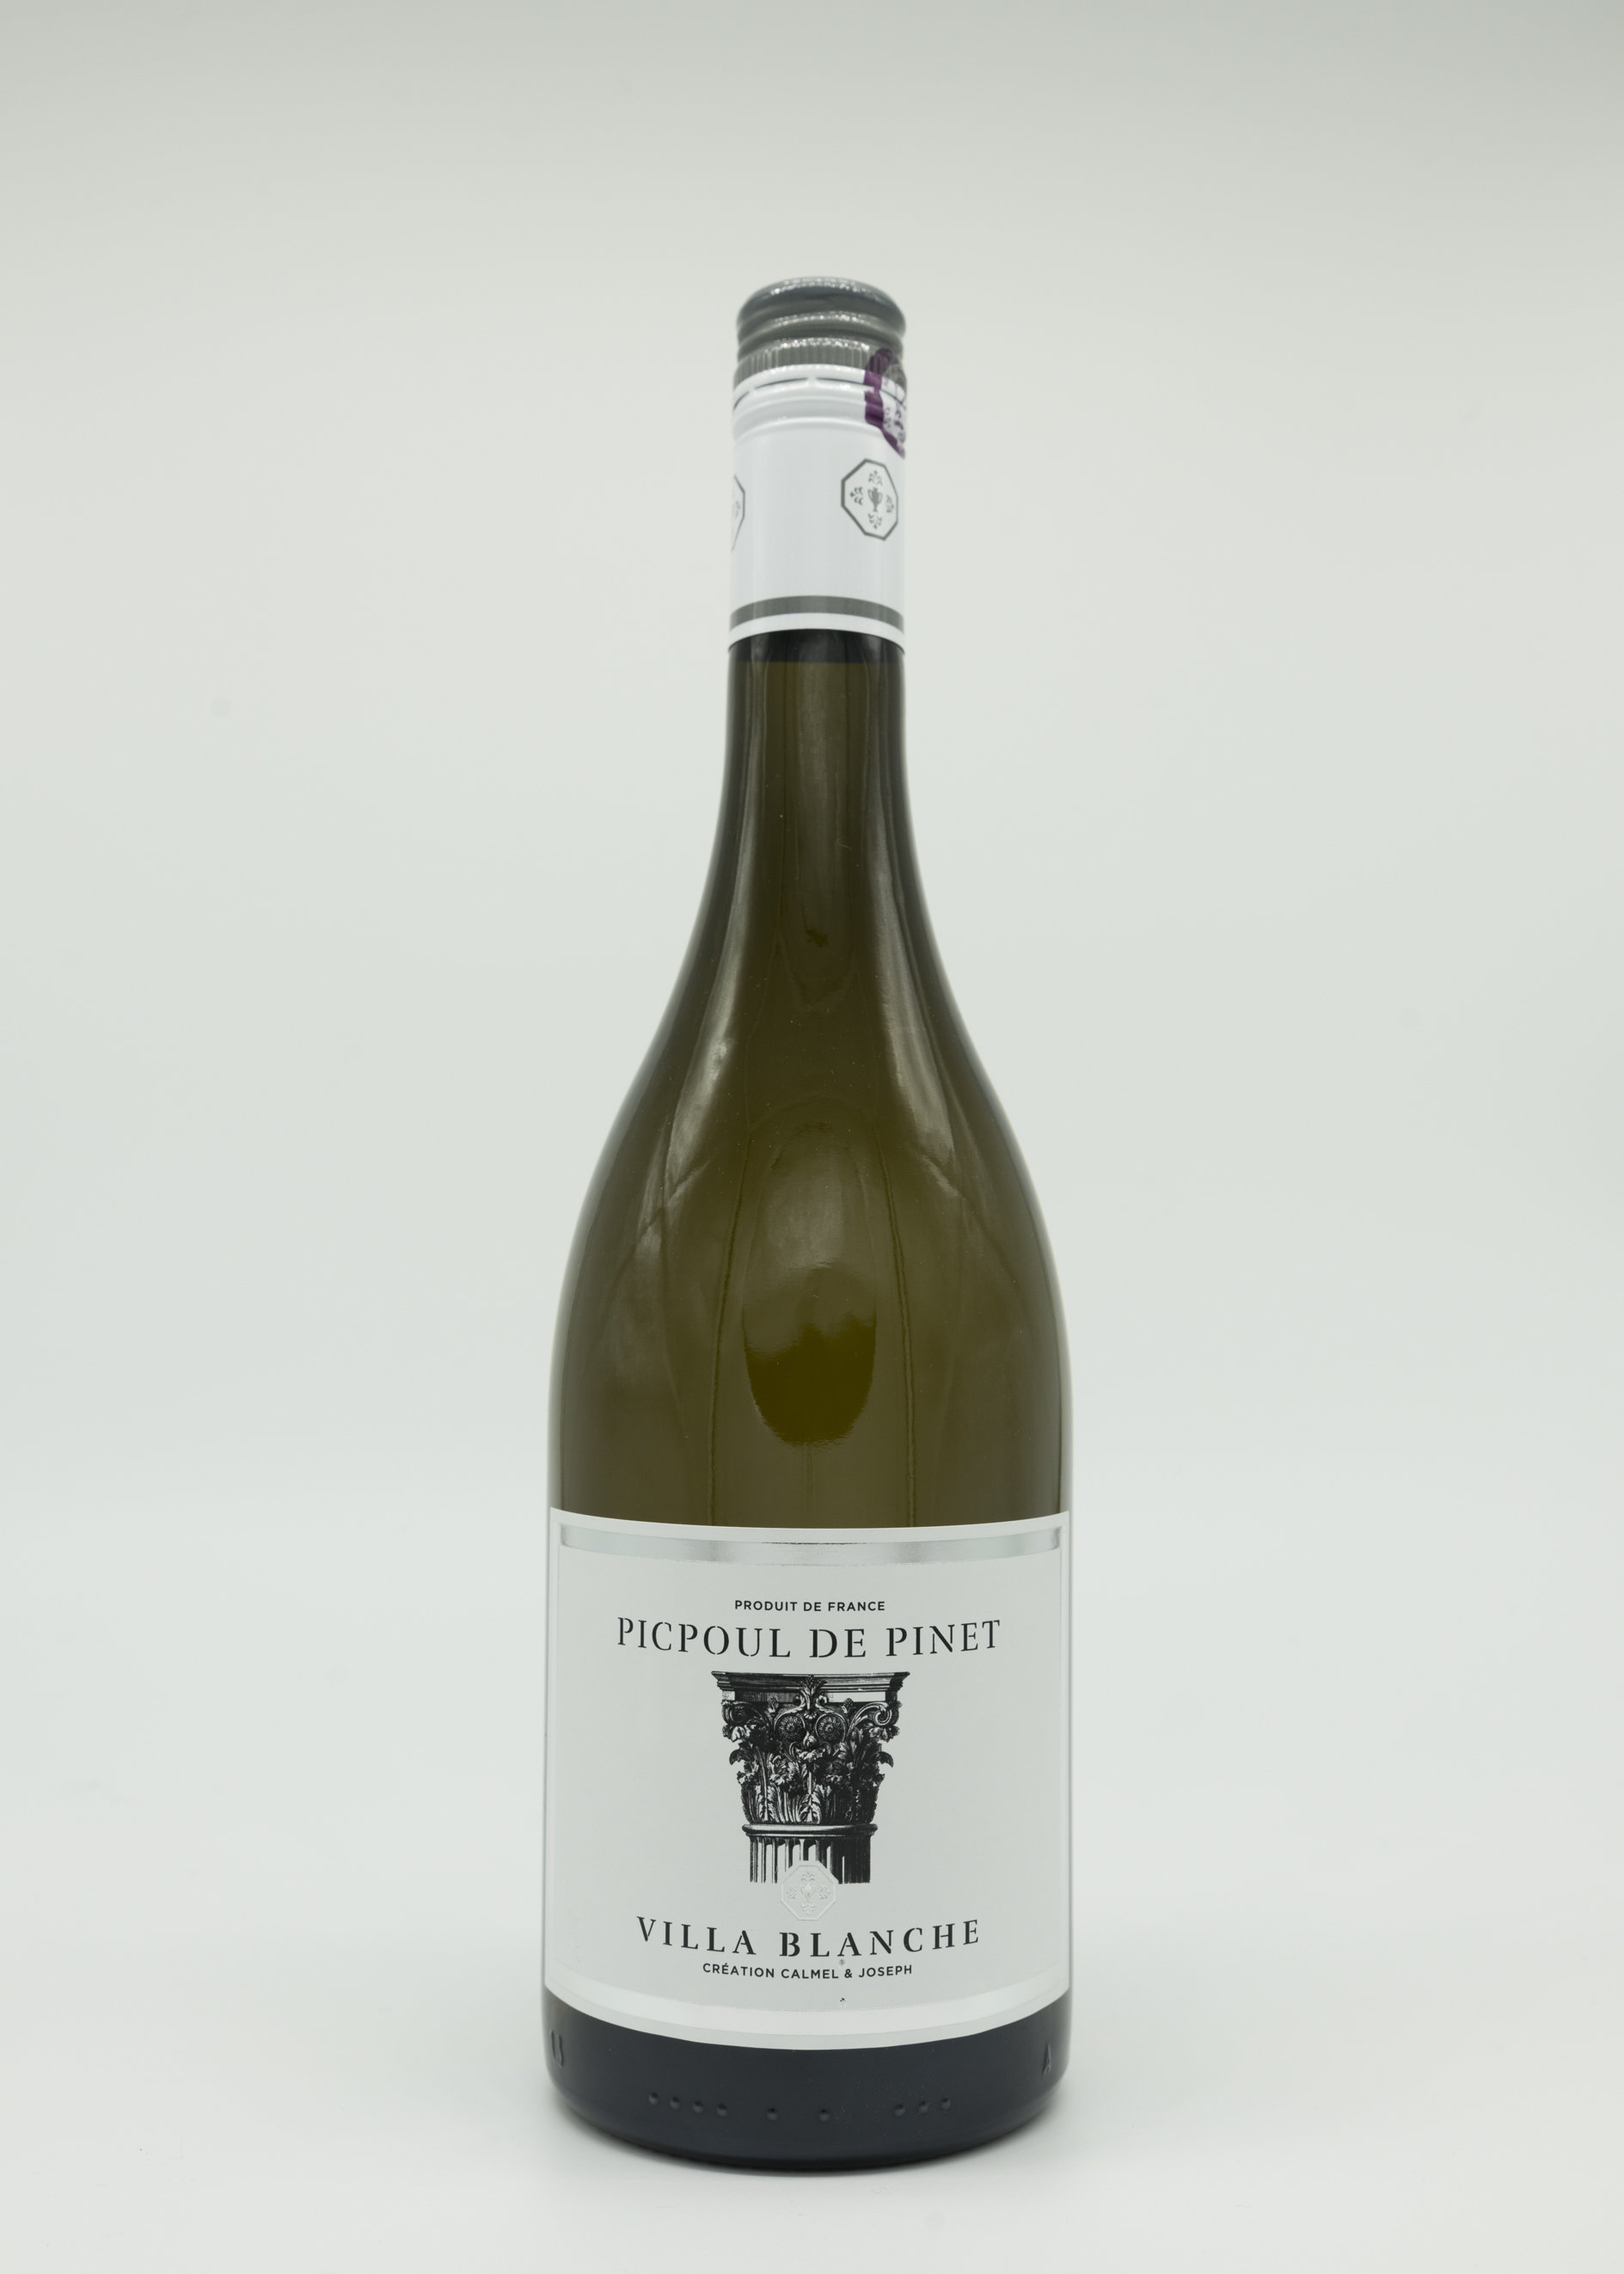 Picpoul de Pinet Villa Blanche, 2018 00032